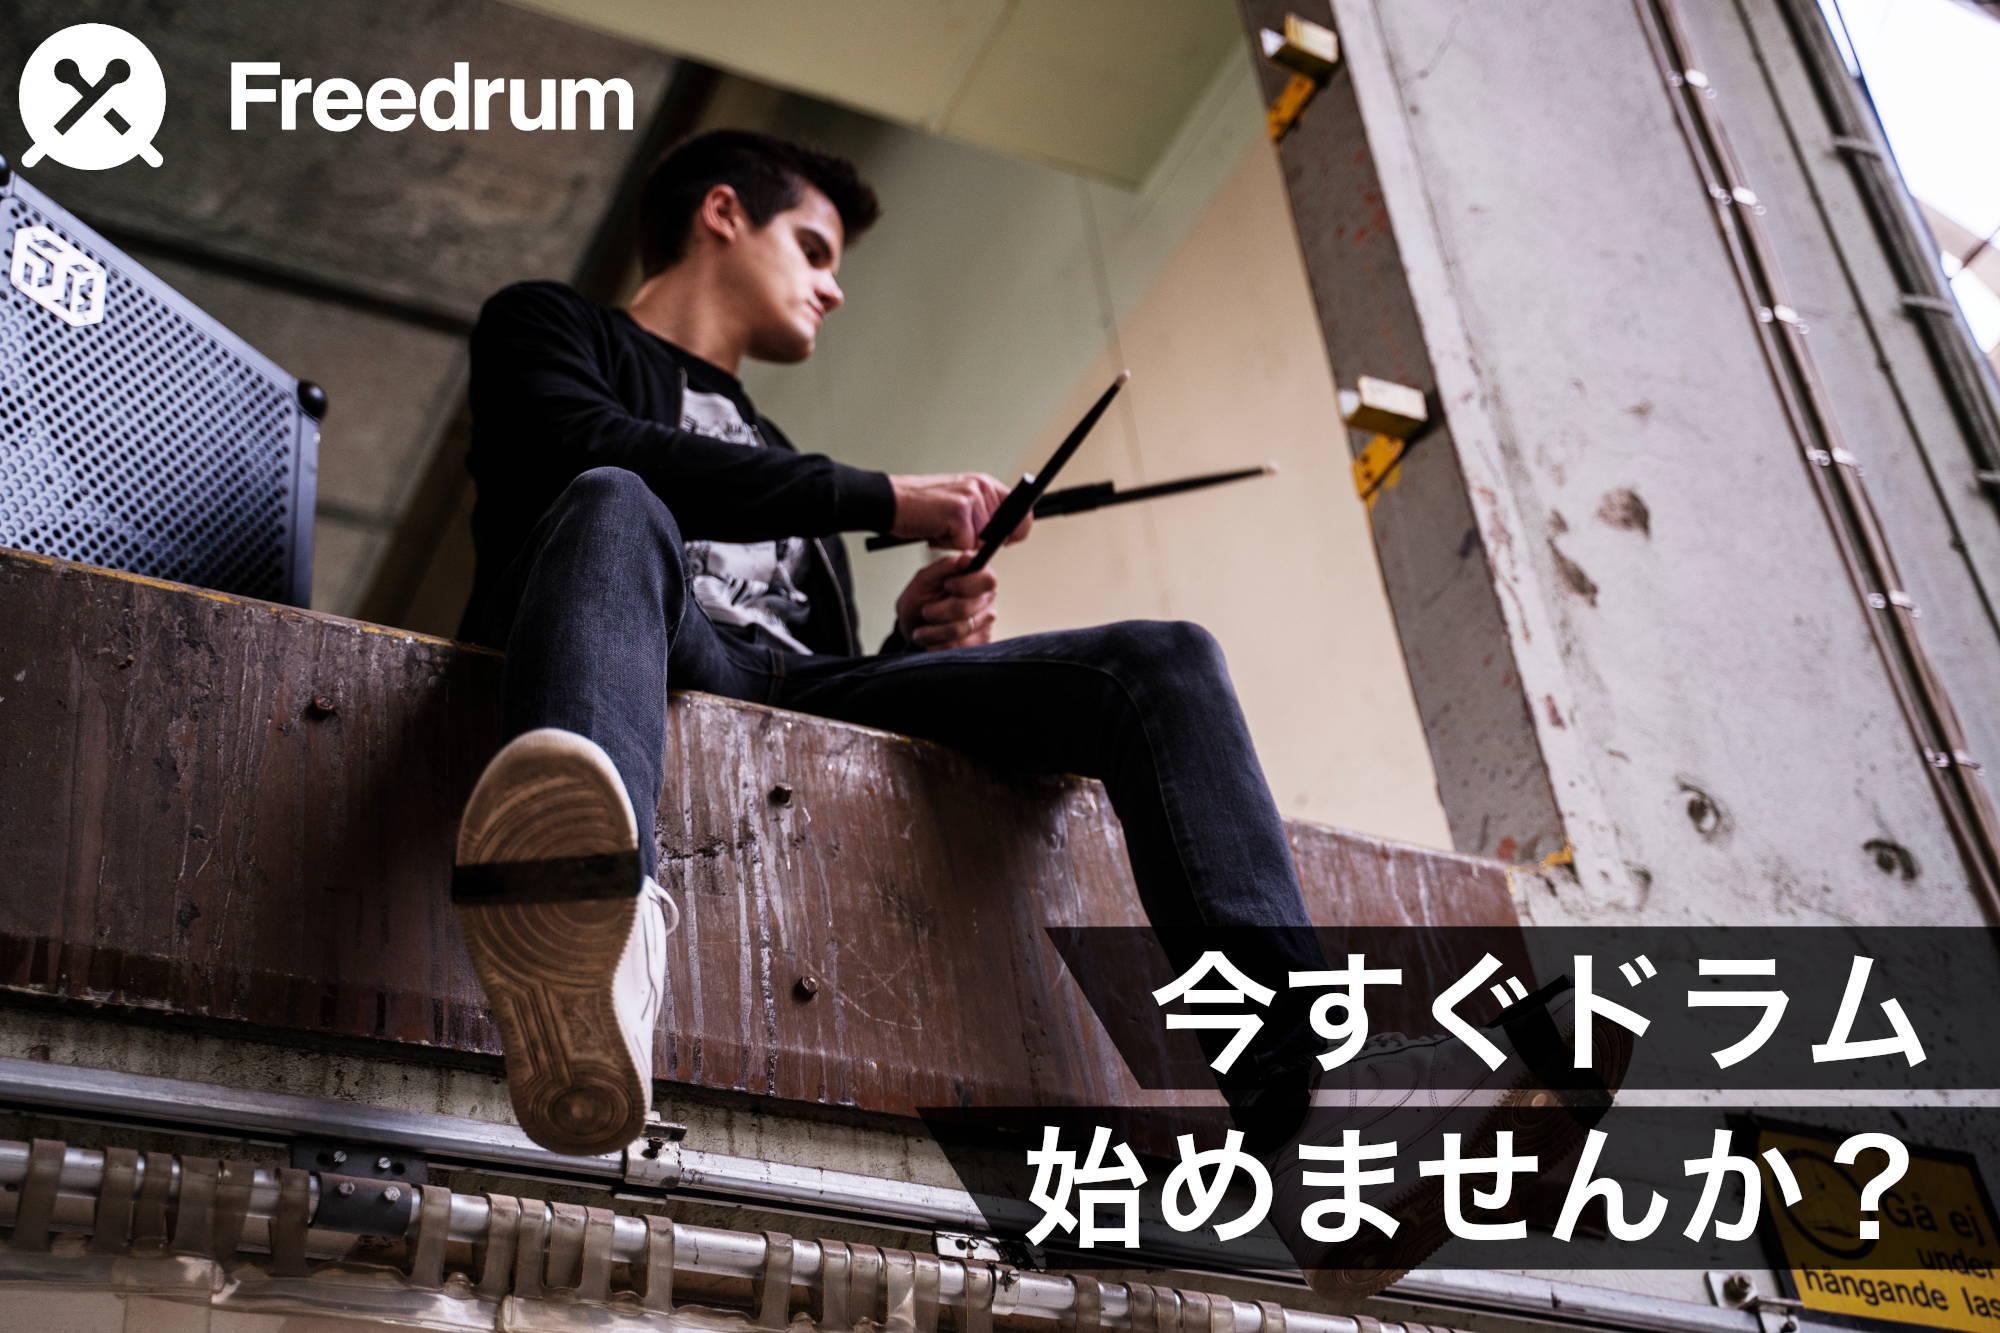 https://store.kibidango.com/products/freedrum